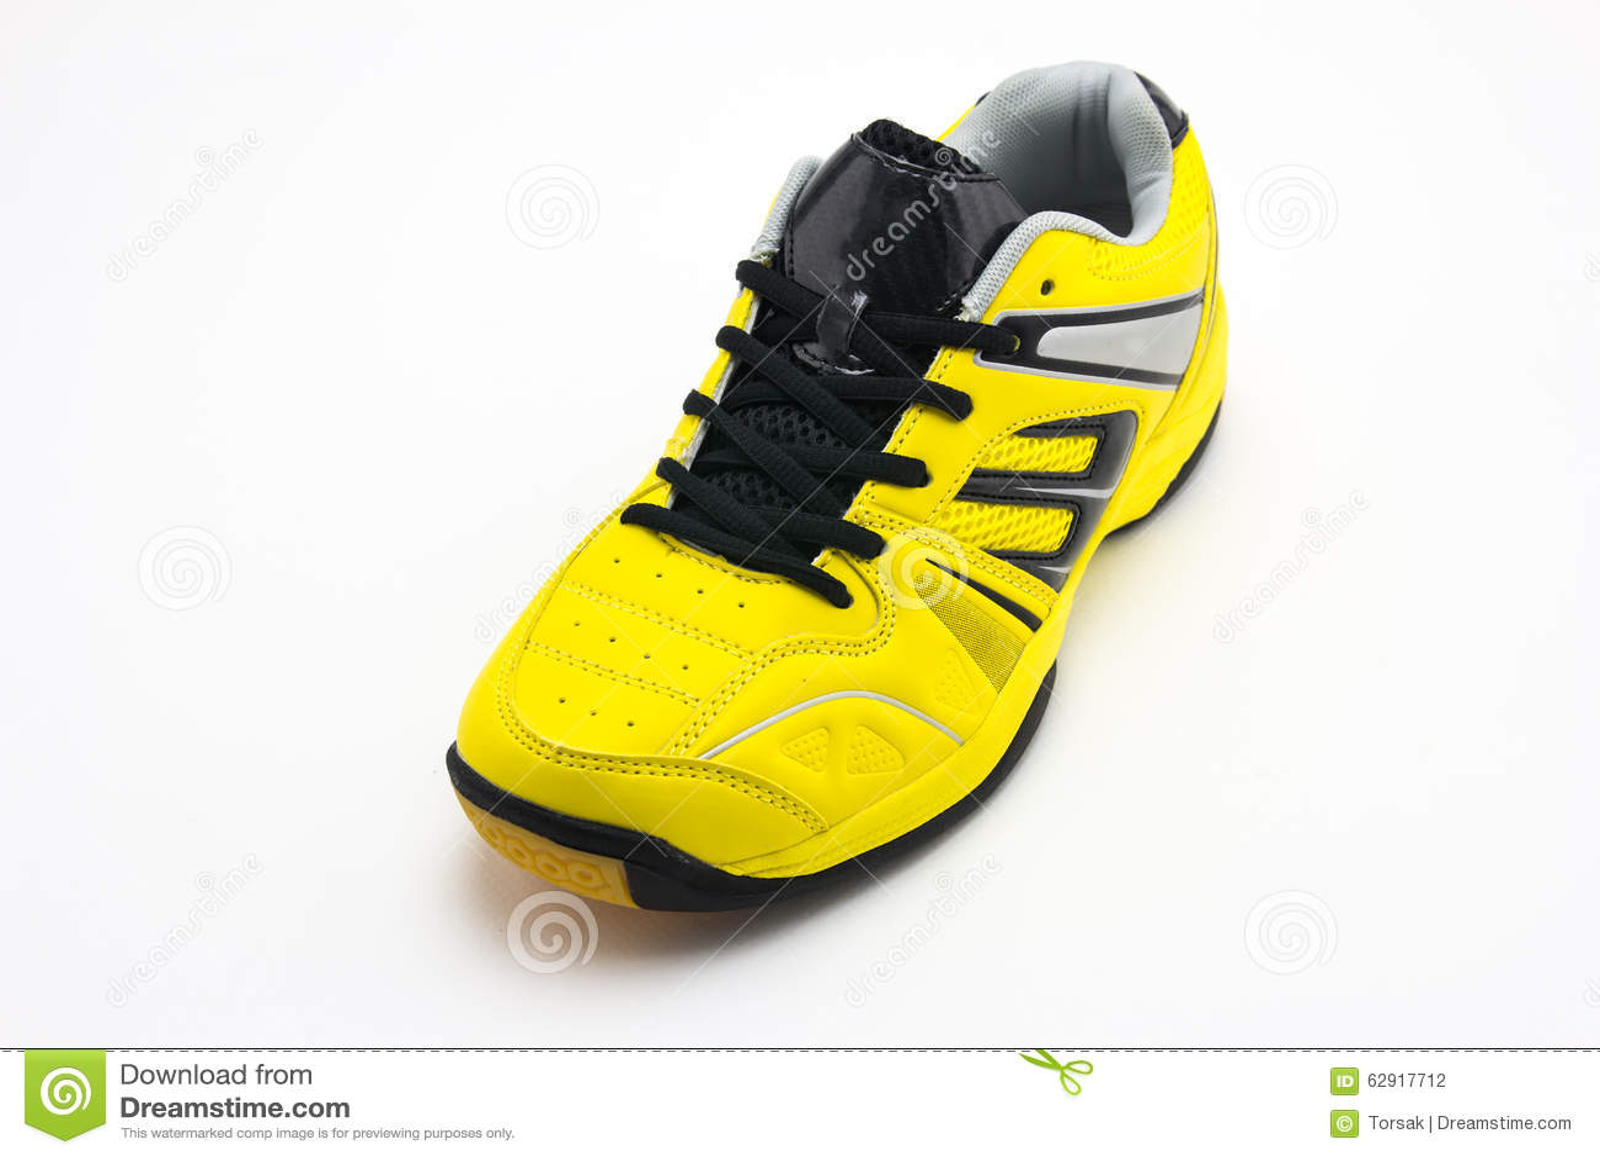 8e645a49971 Κίτρινα αθλητικά παπούτσια στοκ εικόνες. εικόνα από accidence - 62917712